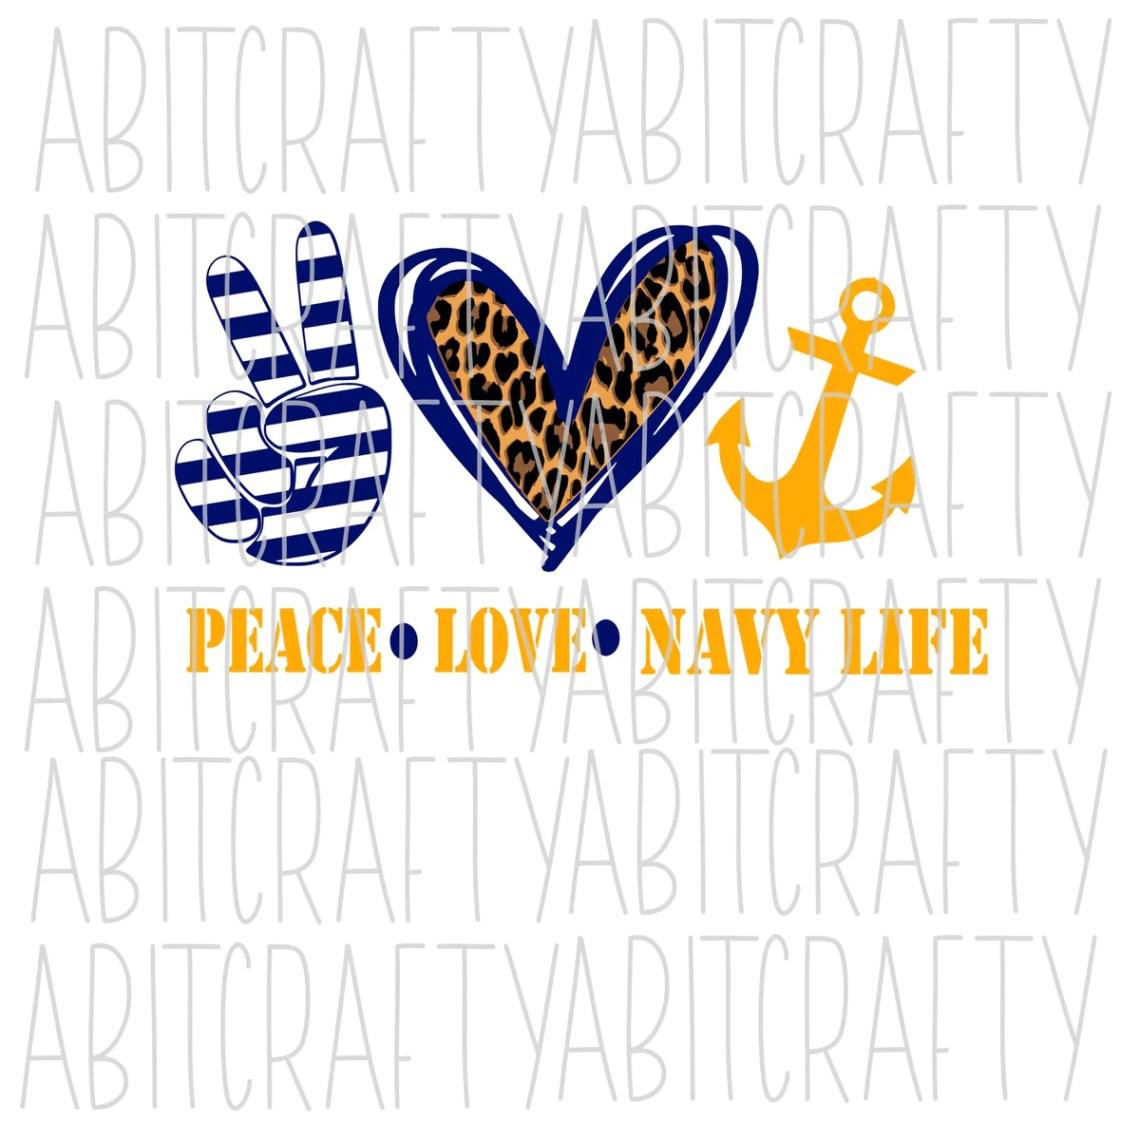 Download Peace, Love, Navy Life svg, png, sublimation, digital ...